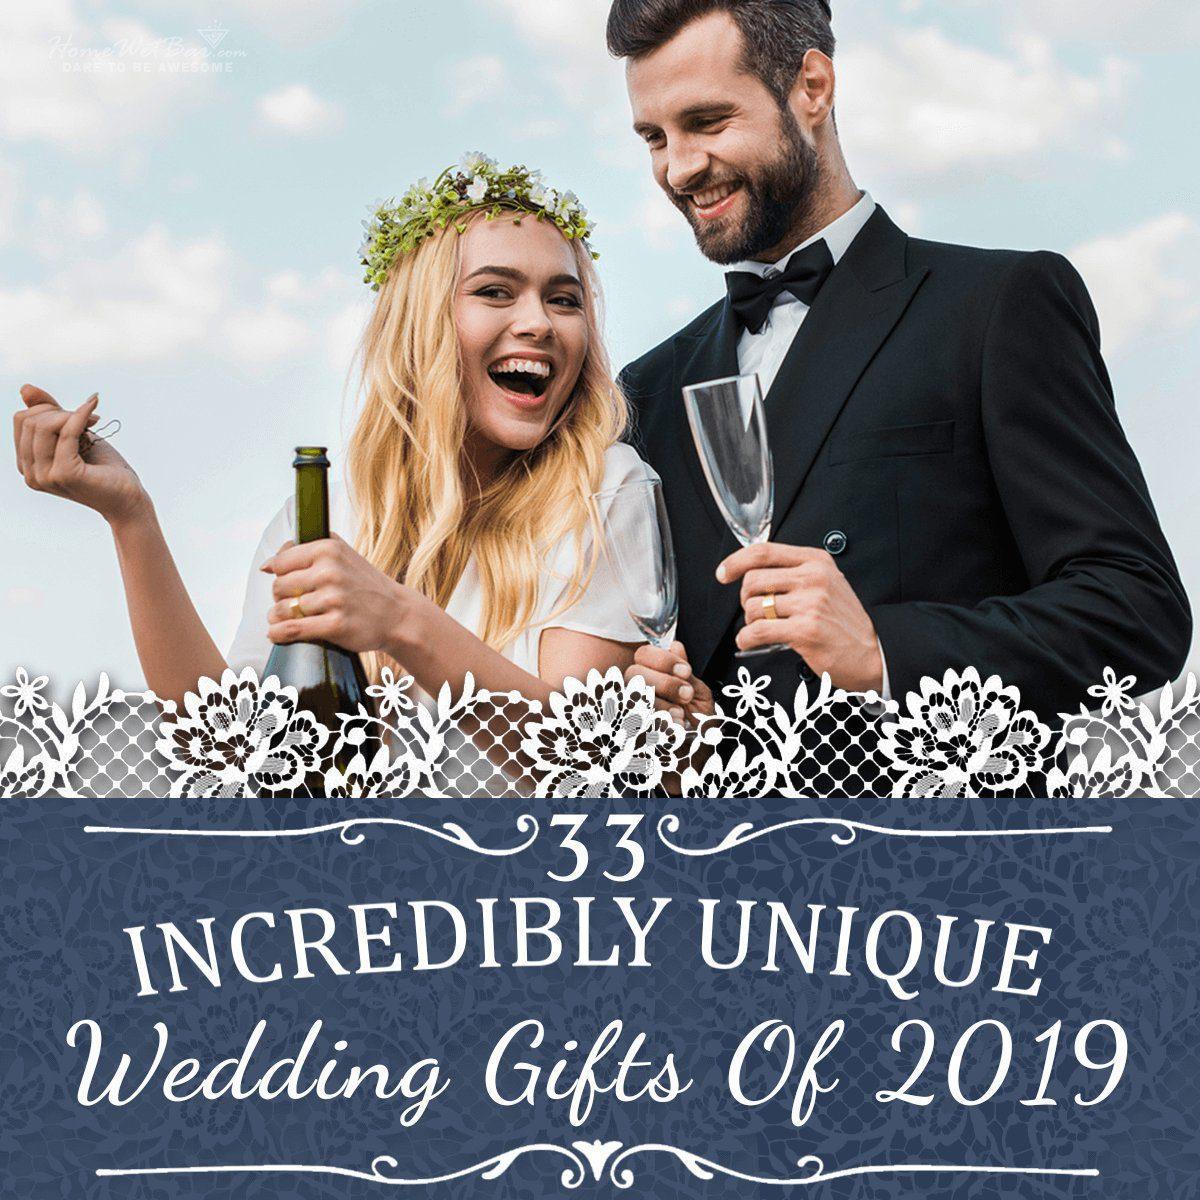 3ef03416c0 33 Incredibly Unique Wedding Gifts of 2019